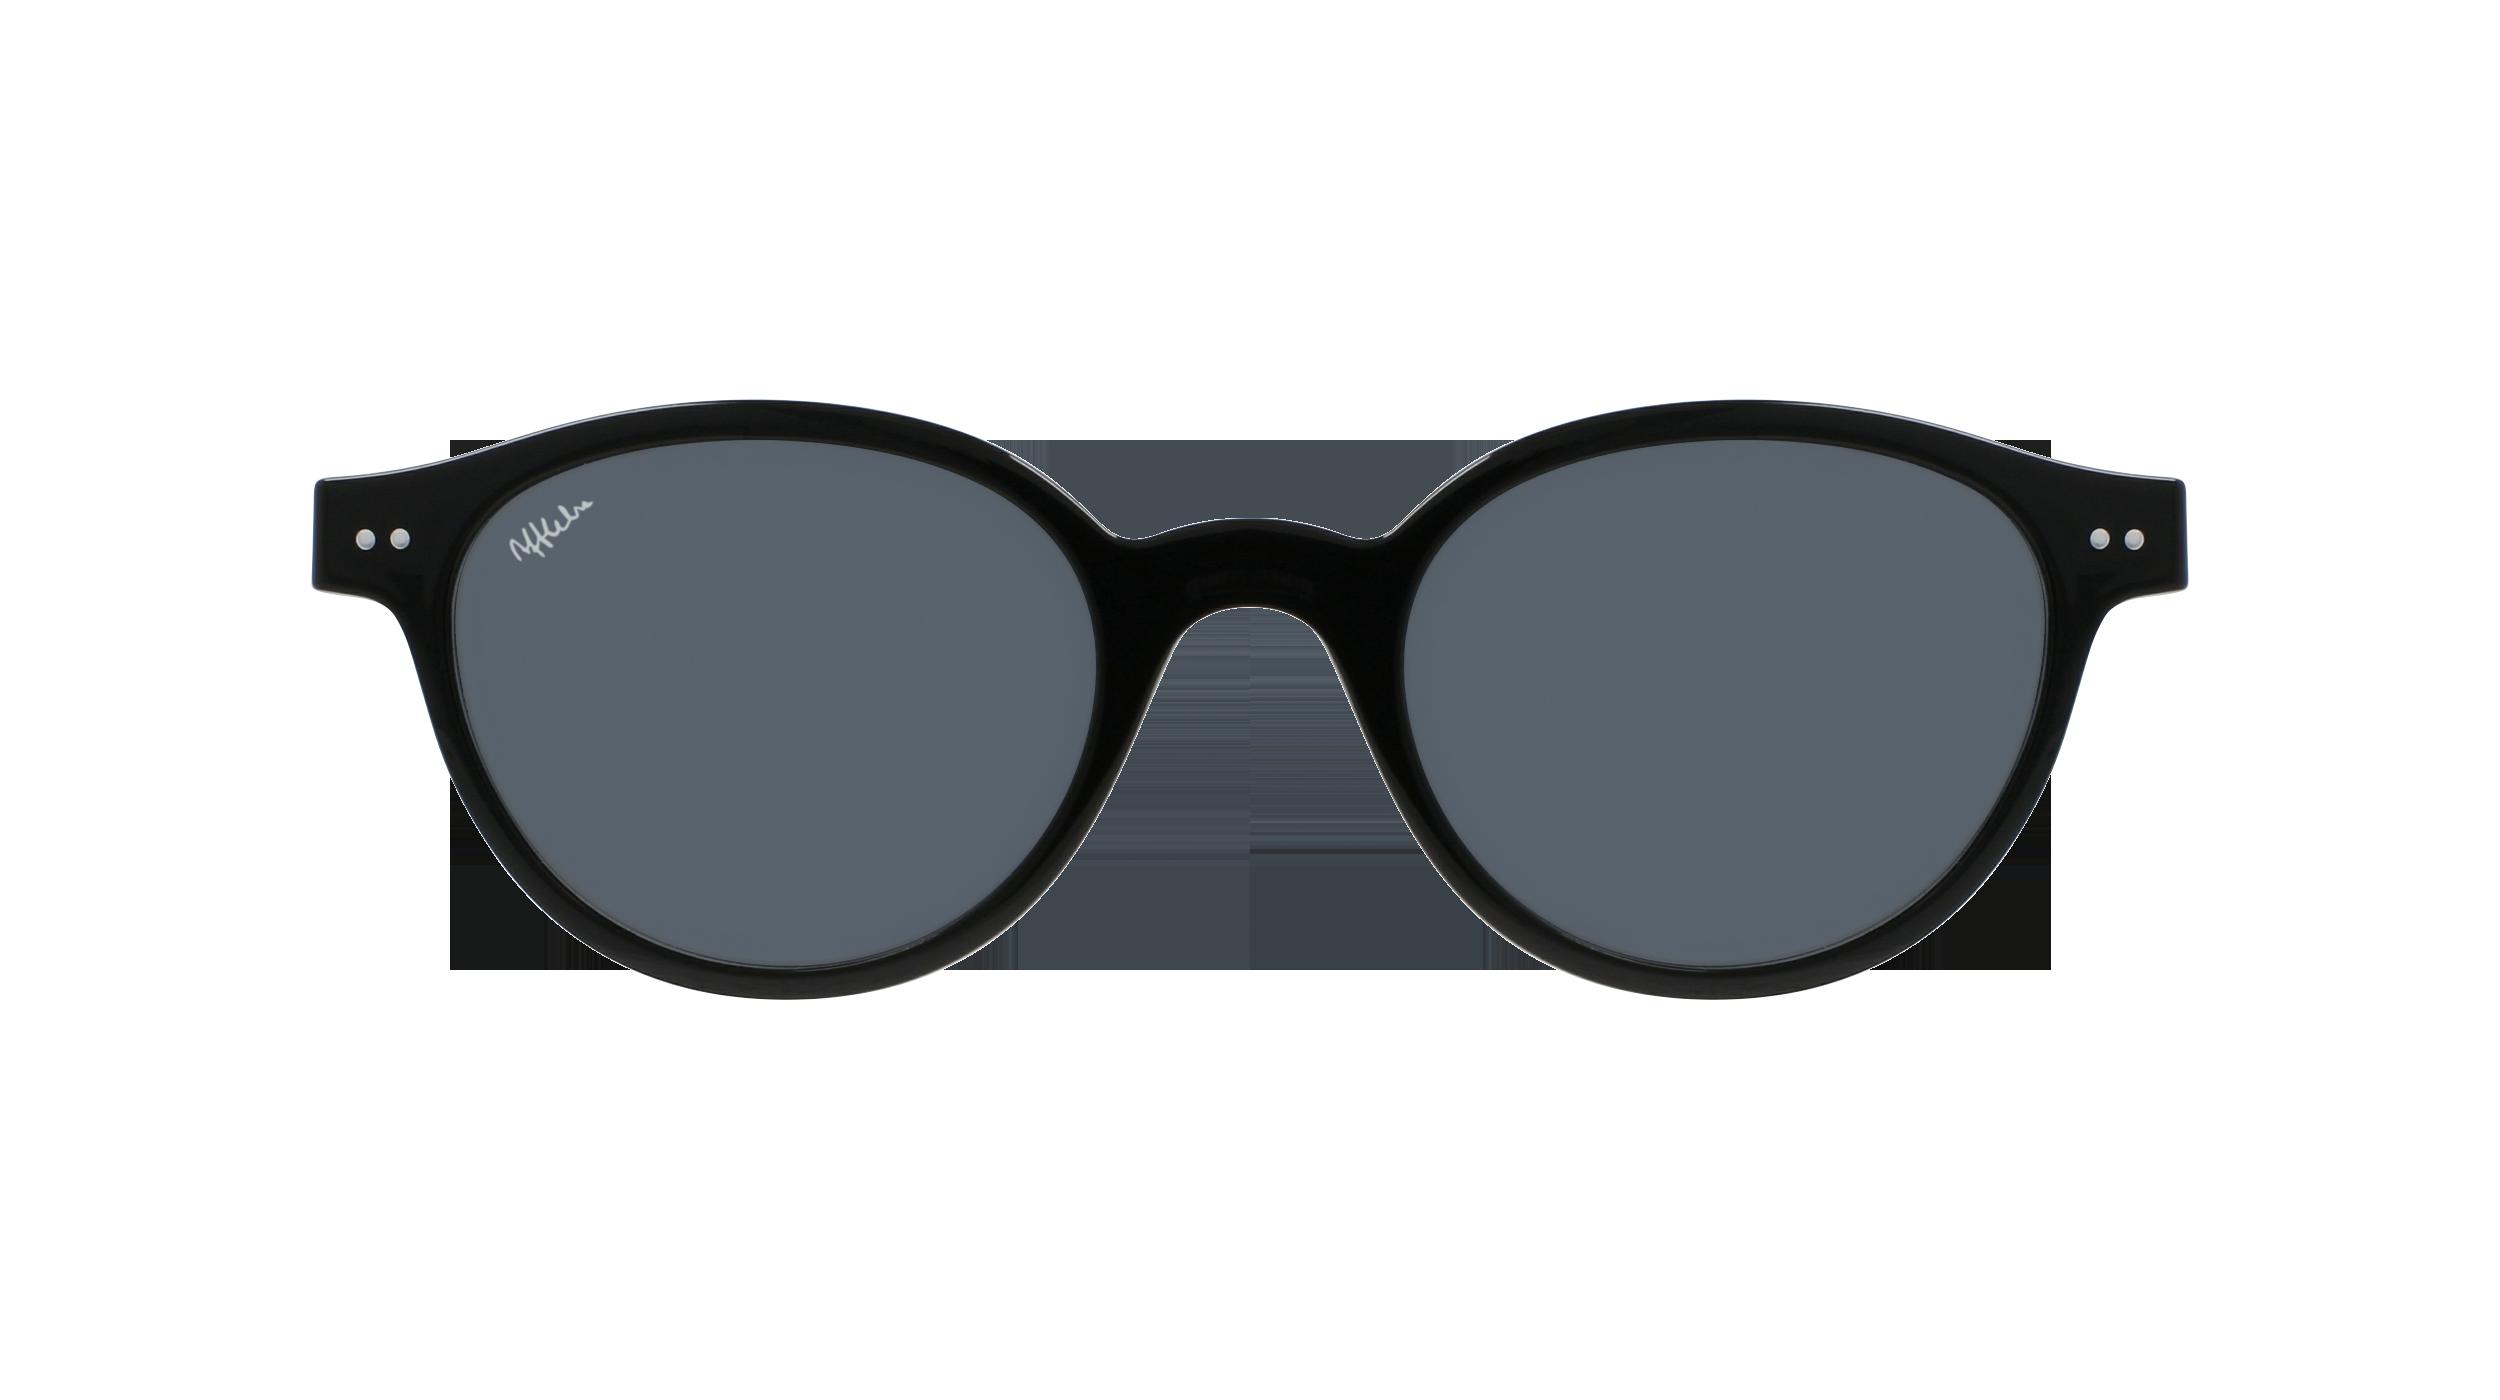 afflelou/france/products/smart_clip/clips_glasses/07630036451120.png